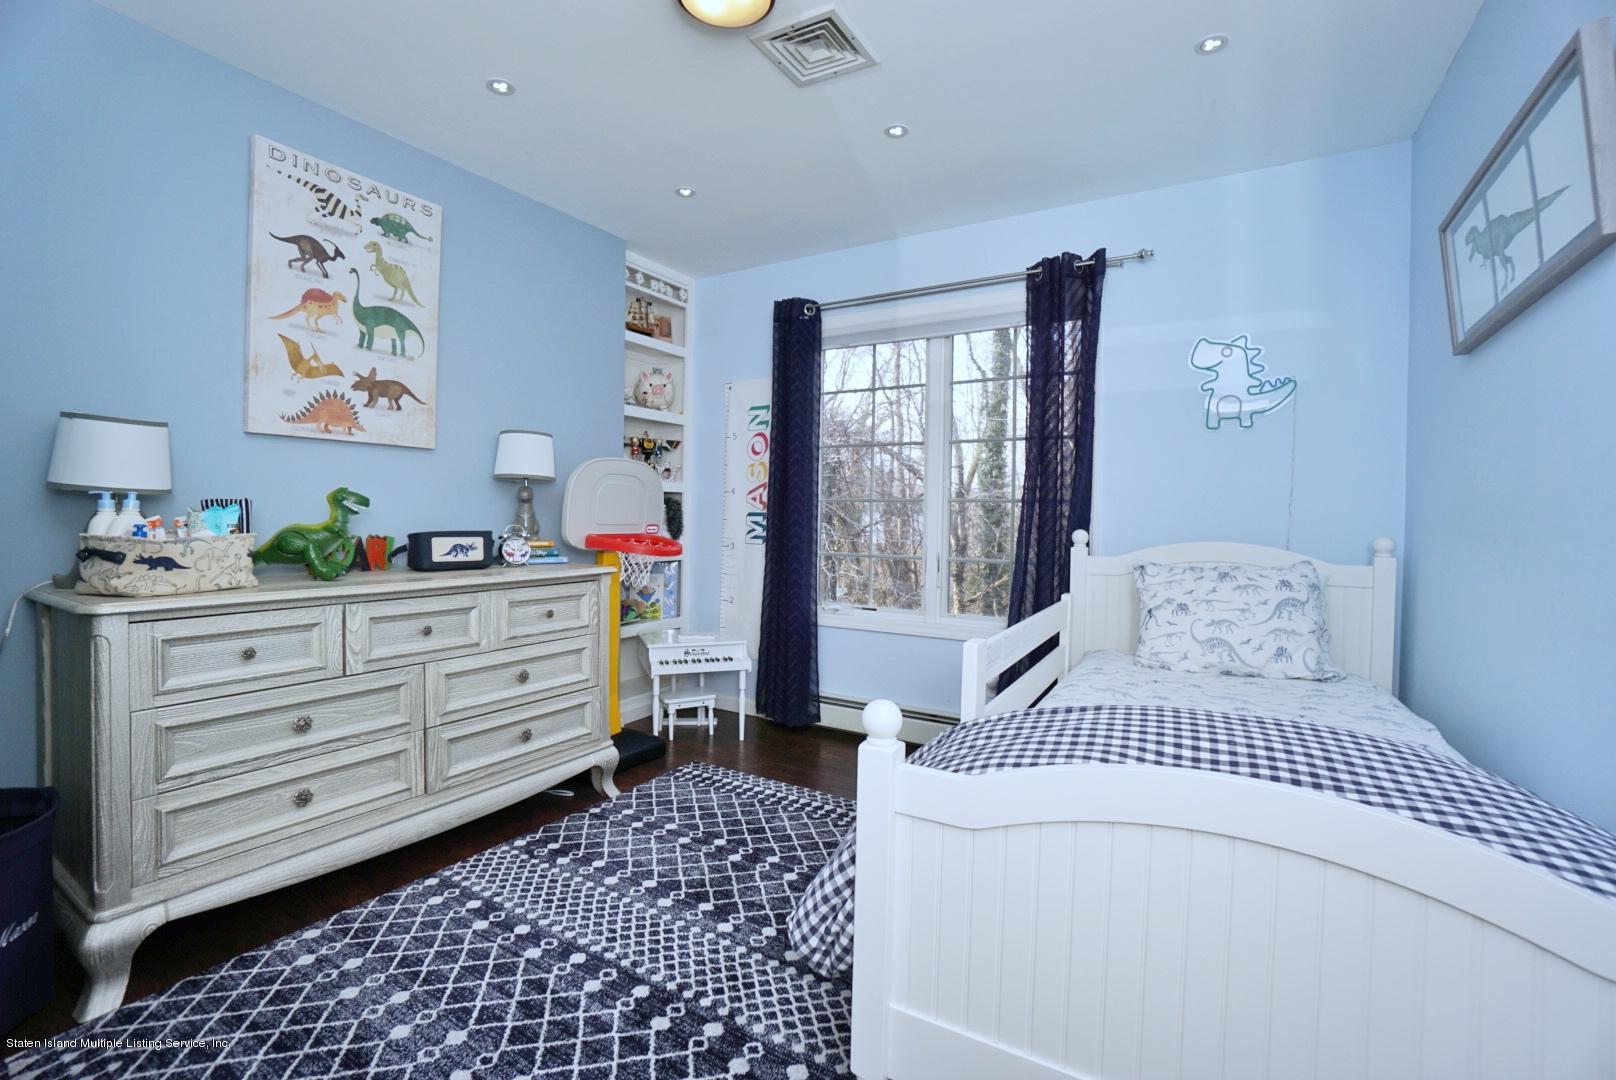 Two Family - Detached 70 Poillon Avenue  Staten Island, NY 10312, MLS-1135570-29